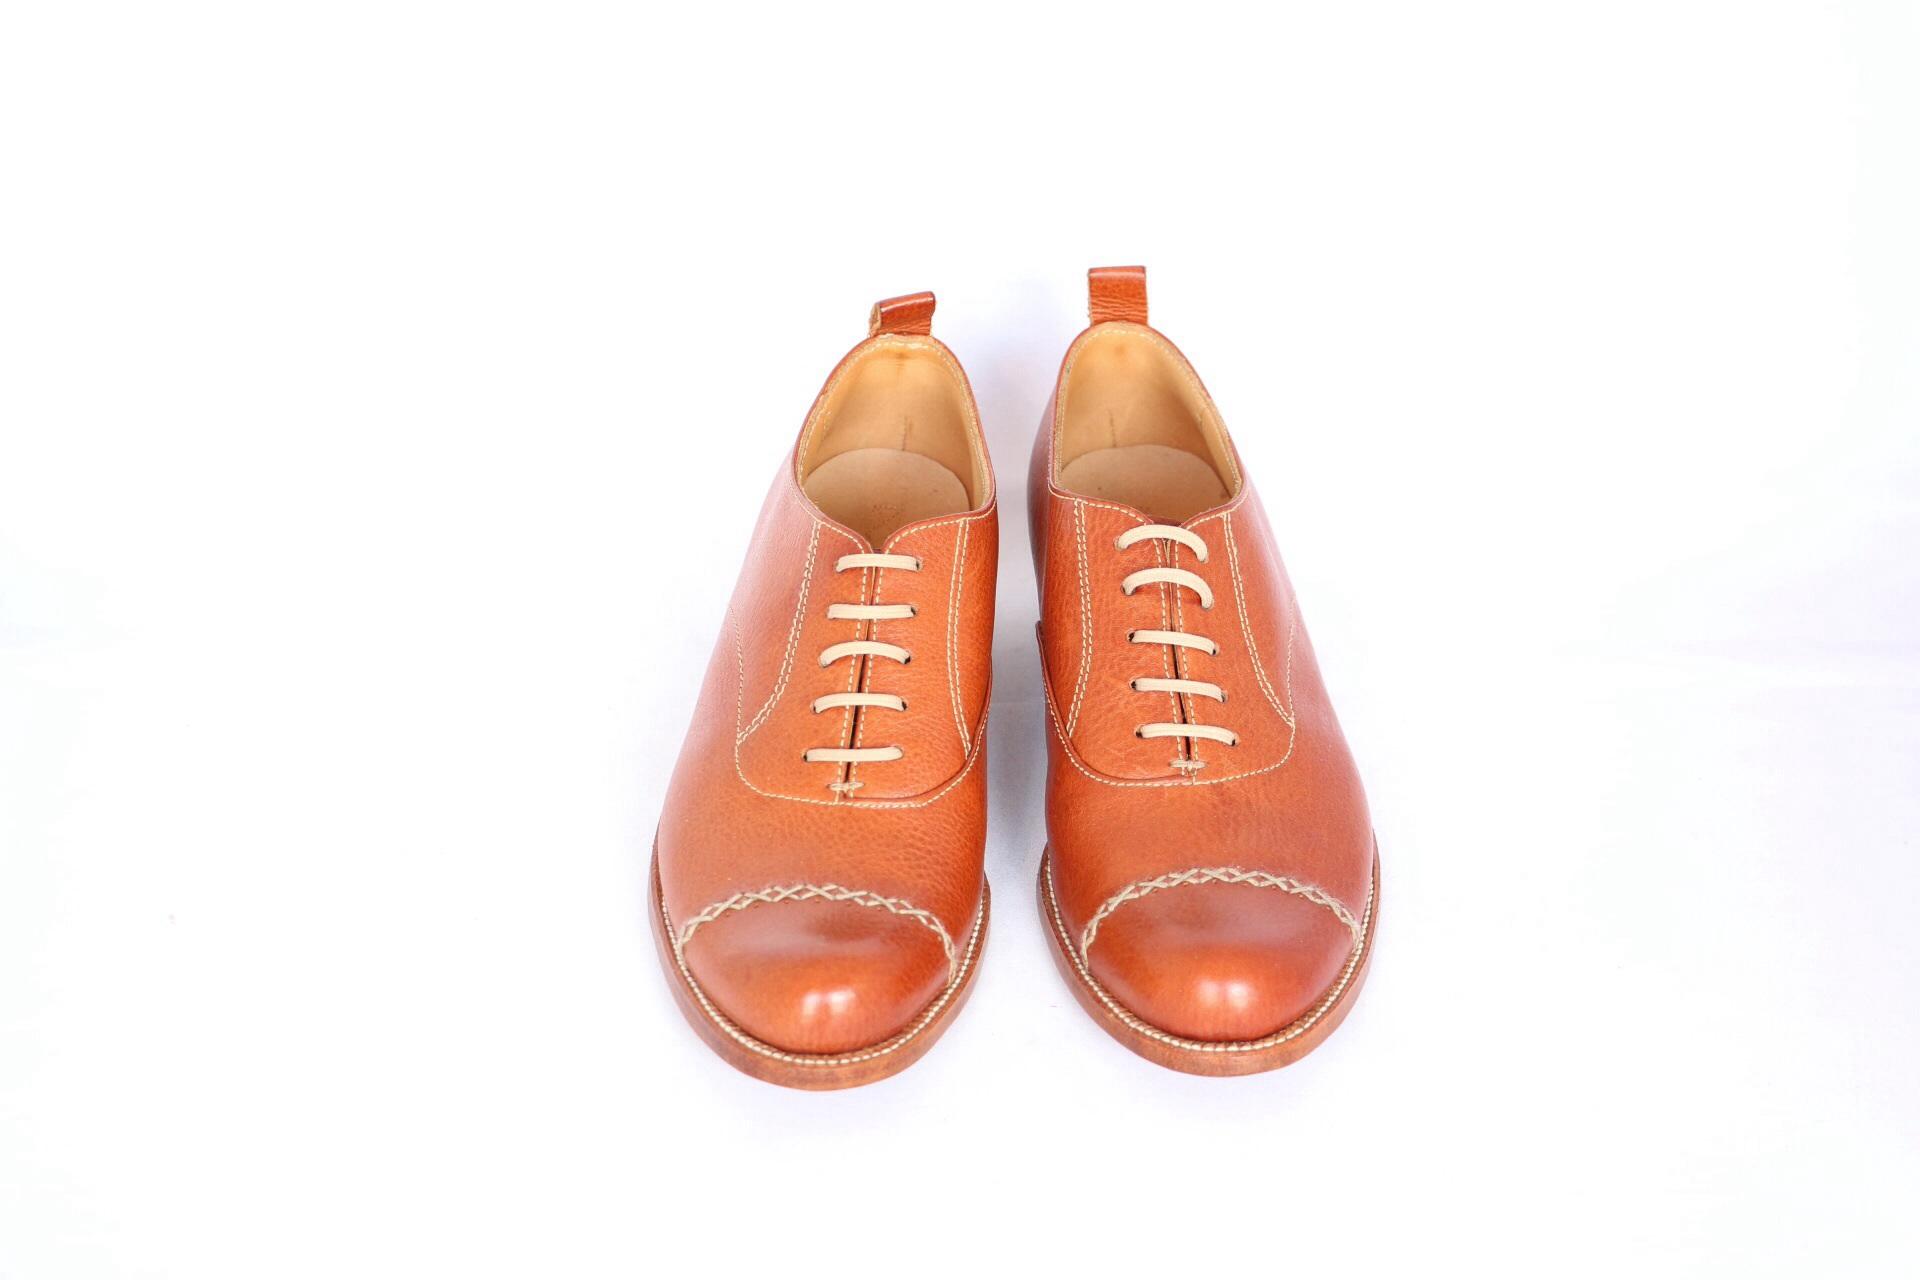 ladies balmoral shoes